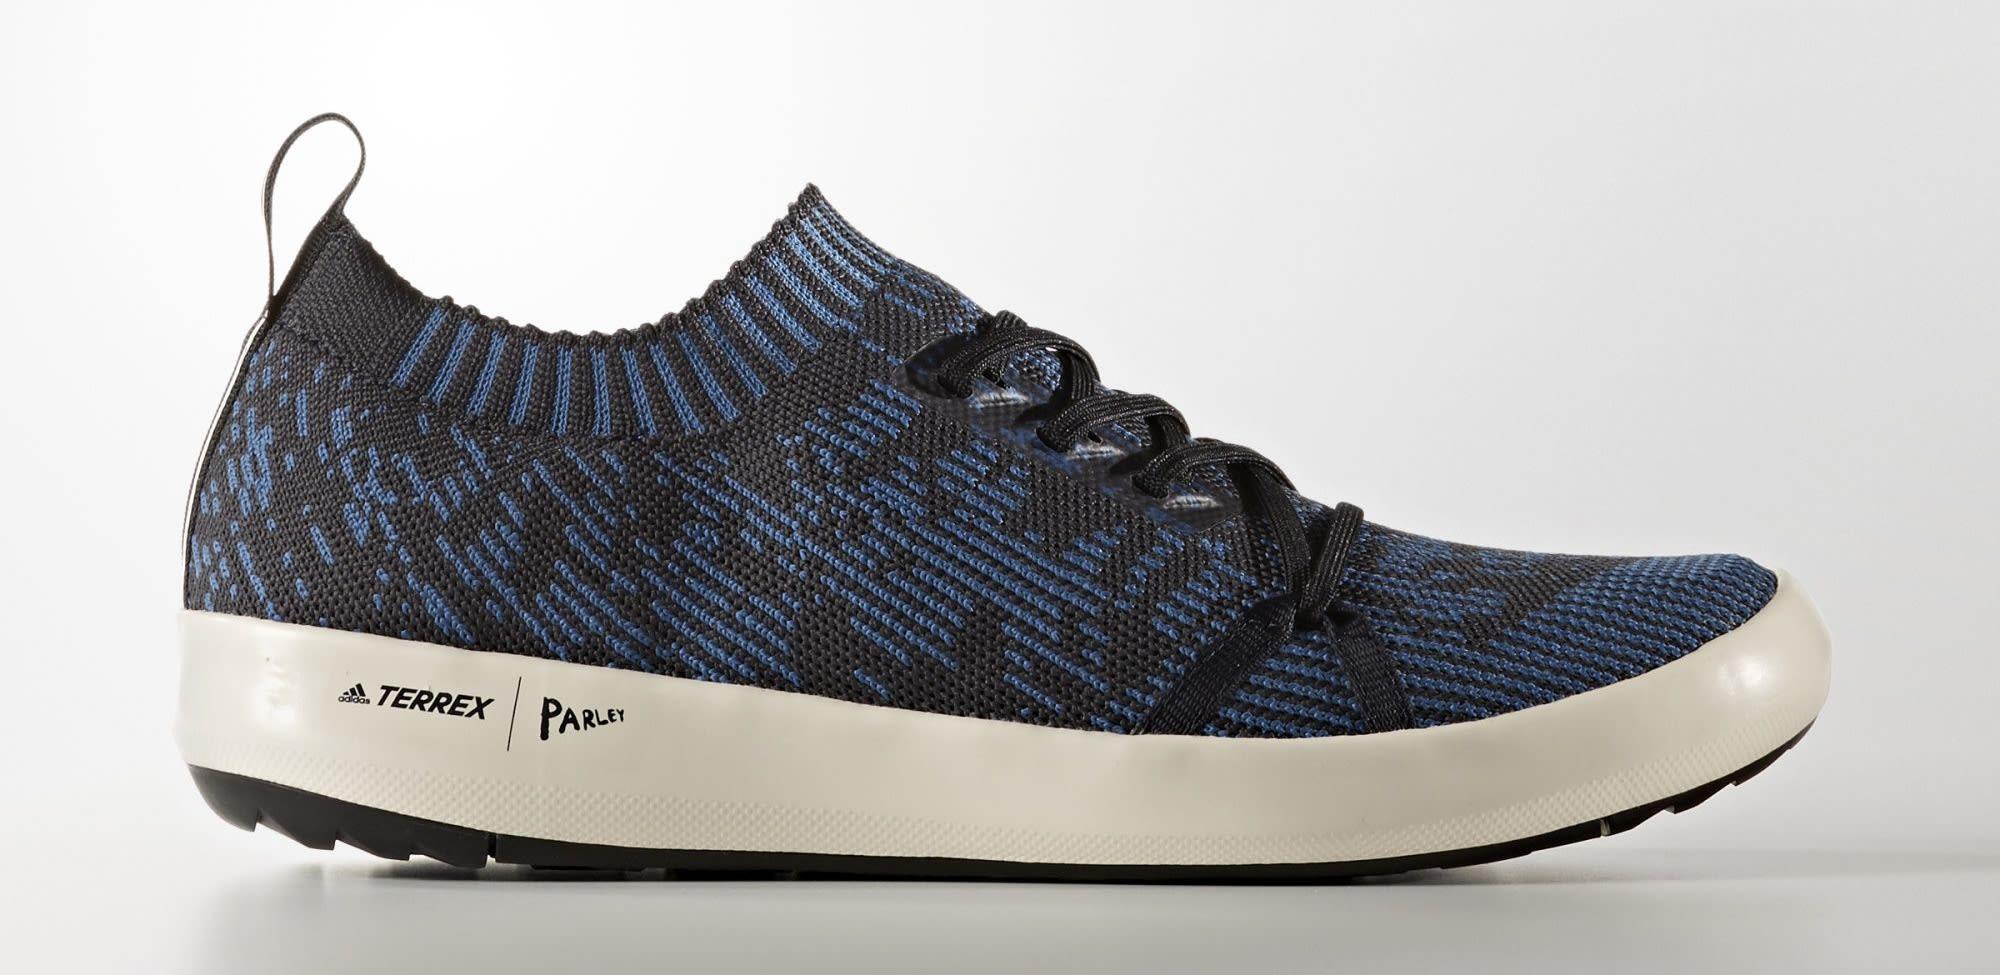 Parley Adidas Boat Shoe CM7846